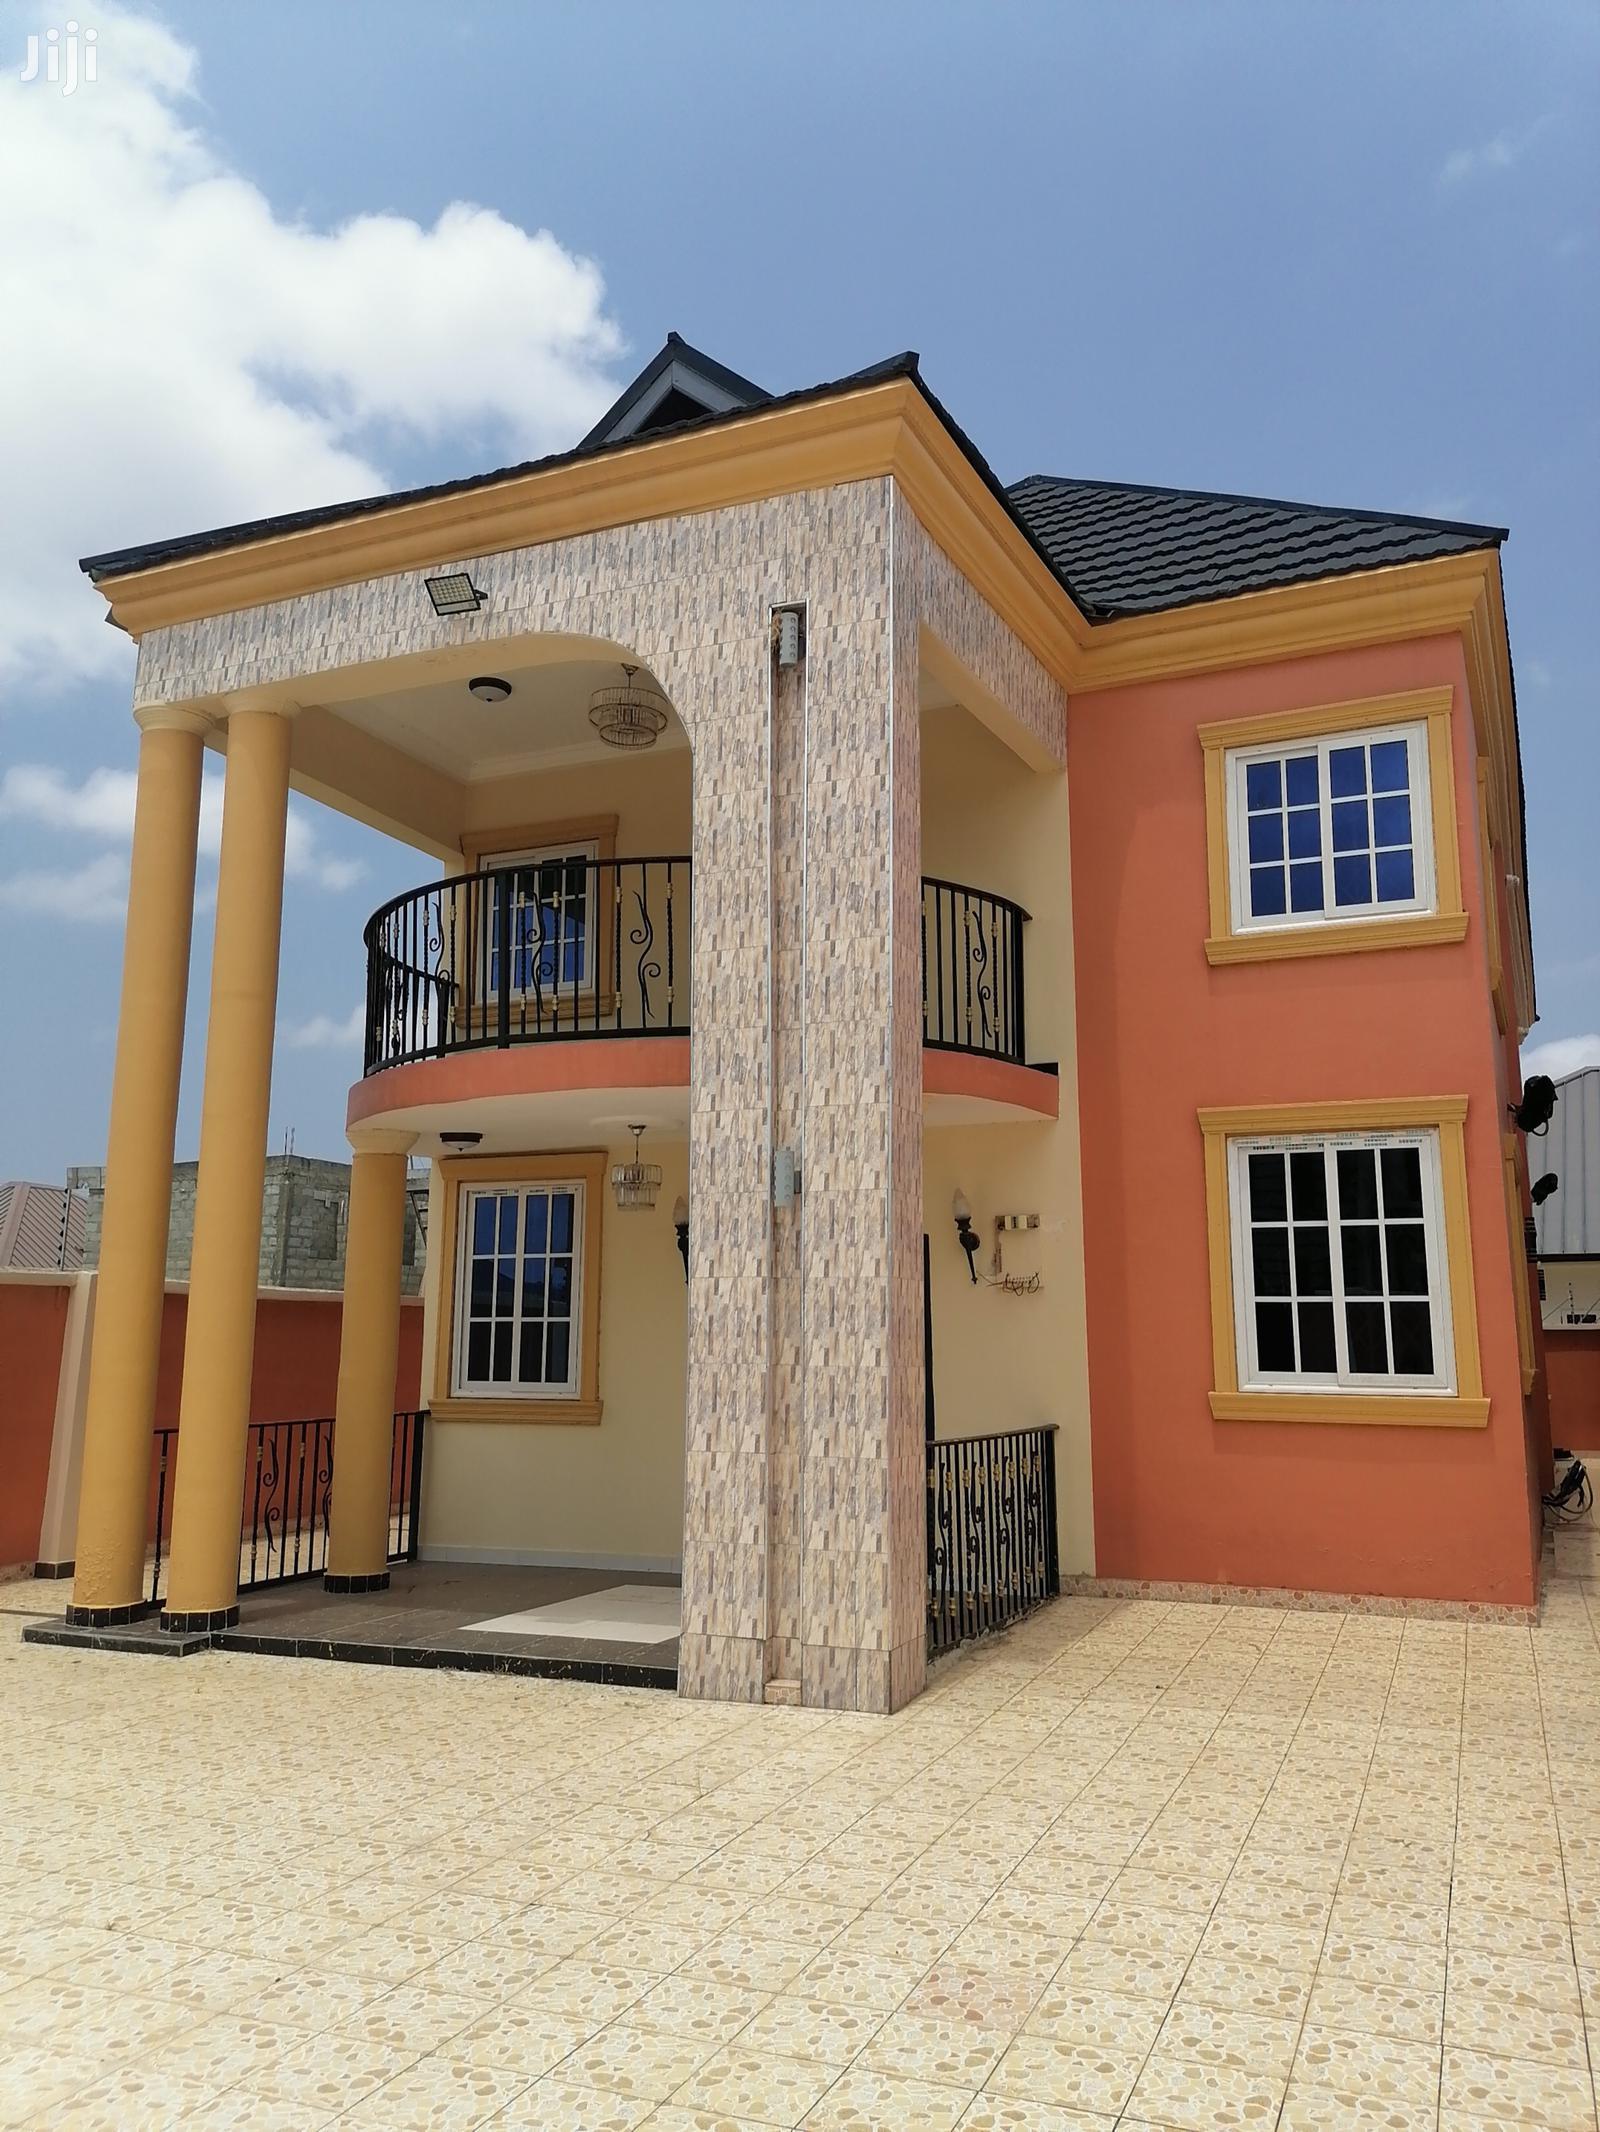 New Exclusive 4 Bedroom Duplex For Rent At East Legon Hills